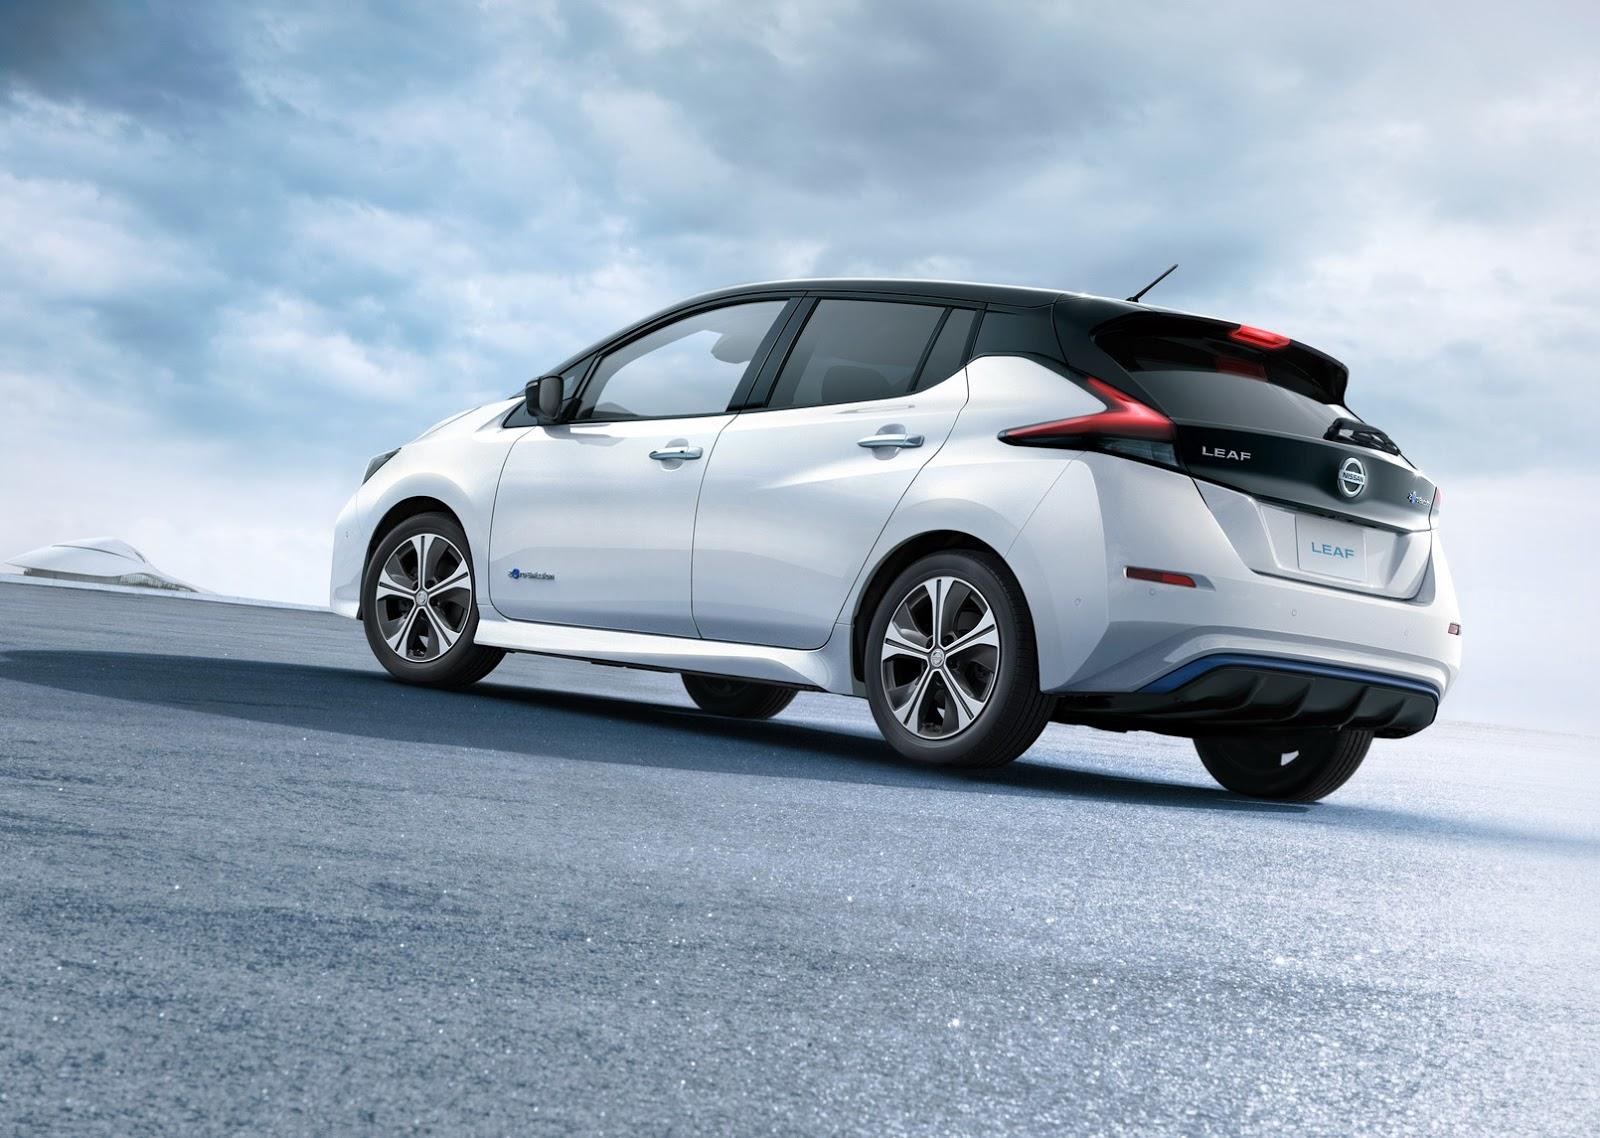 Nissan Leaf 2018 EU (24)